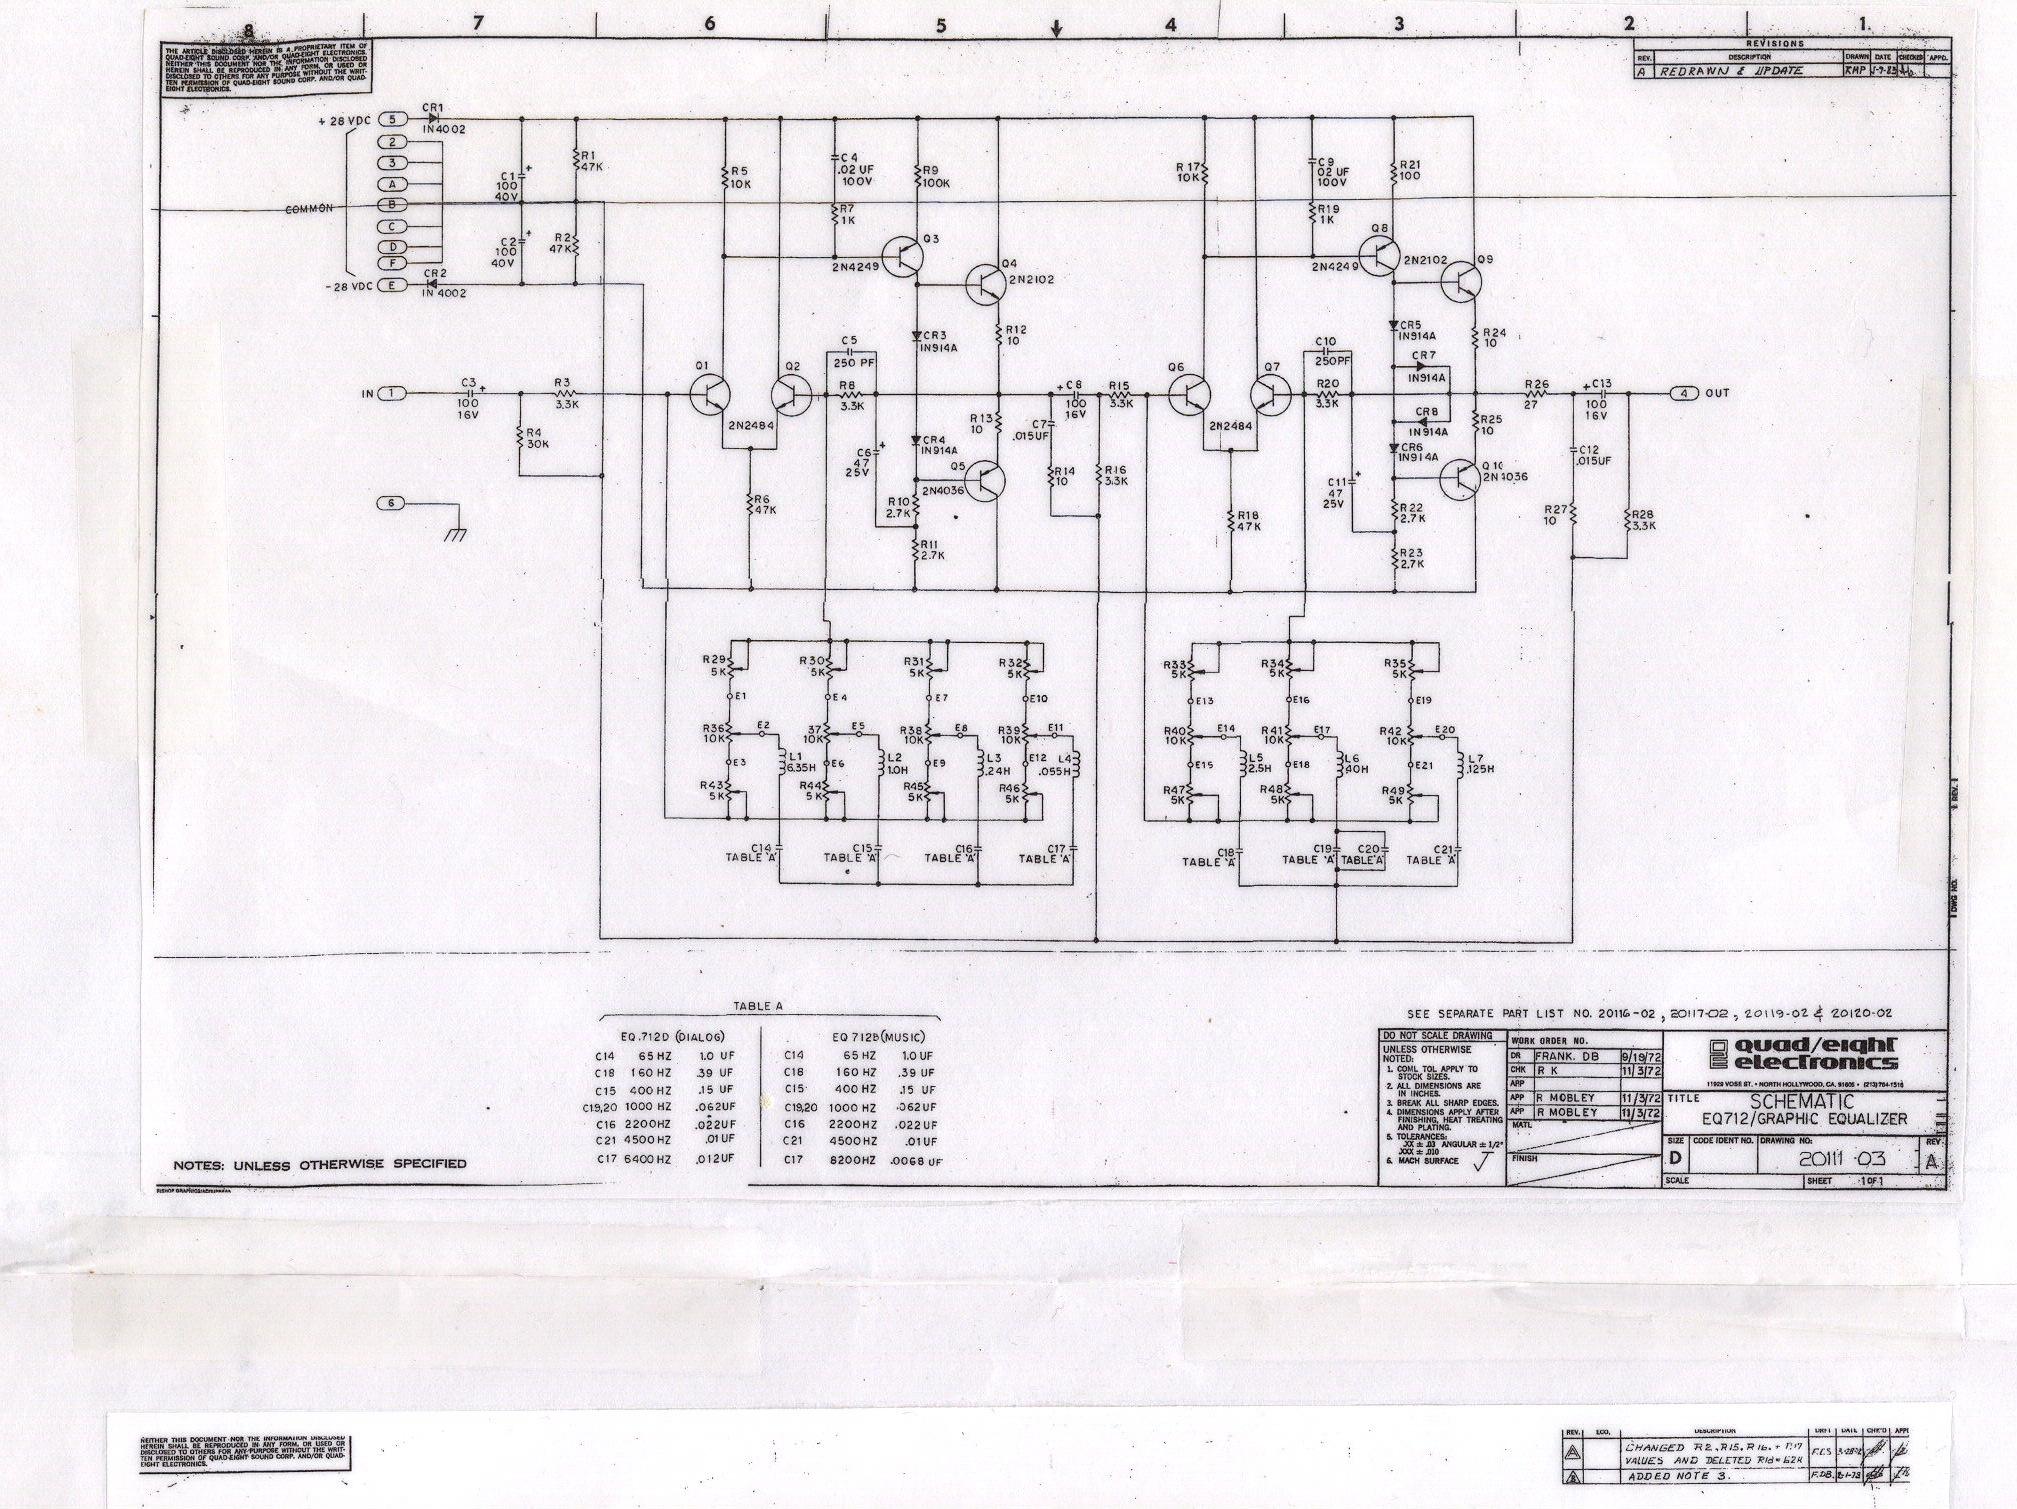 Quad Eight 712 Graphic Eq 5 Band Equaliser Circuit Diagram Http Farm6staticflickrcom 5206 5278034584 Ae17c367ce O